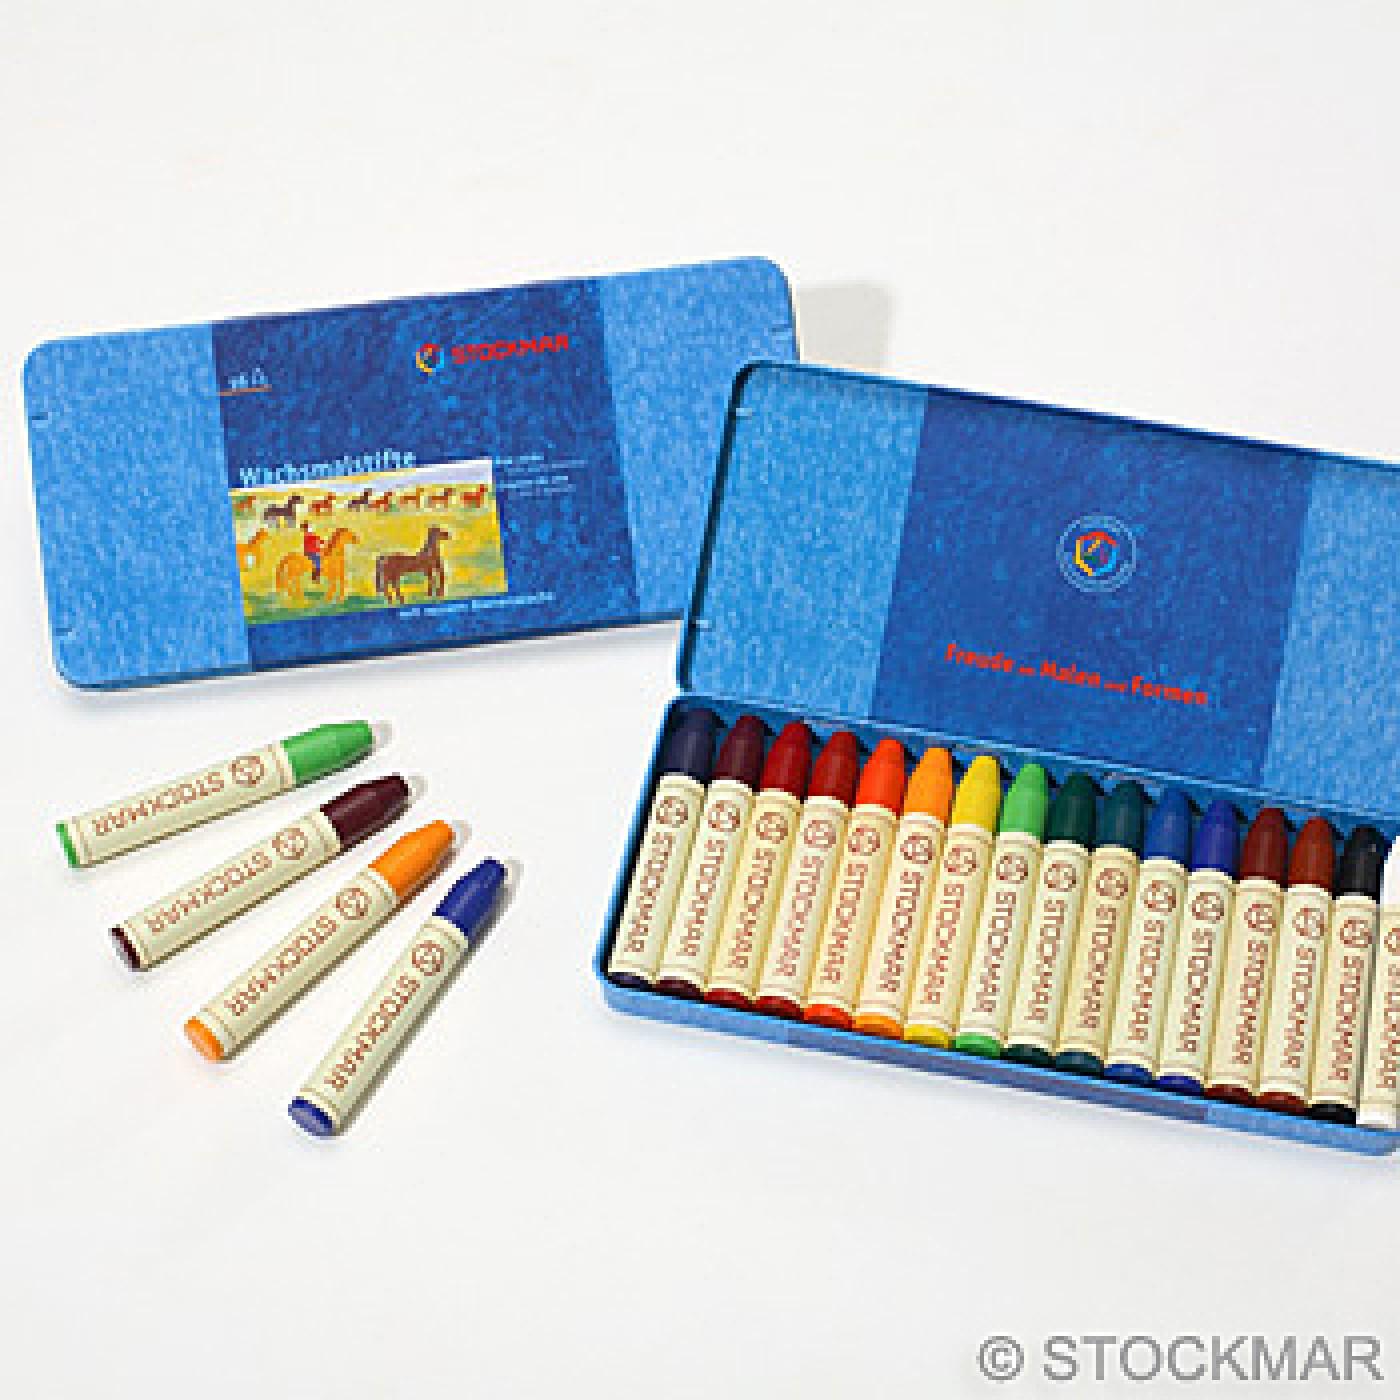 Stockmar Wax Stick Crayons - 16 Asst Colors